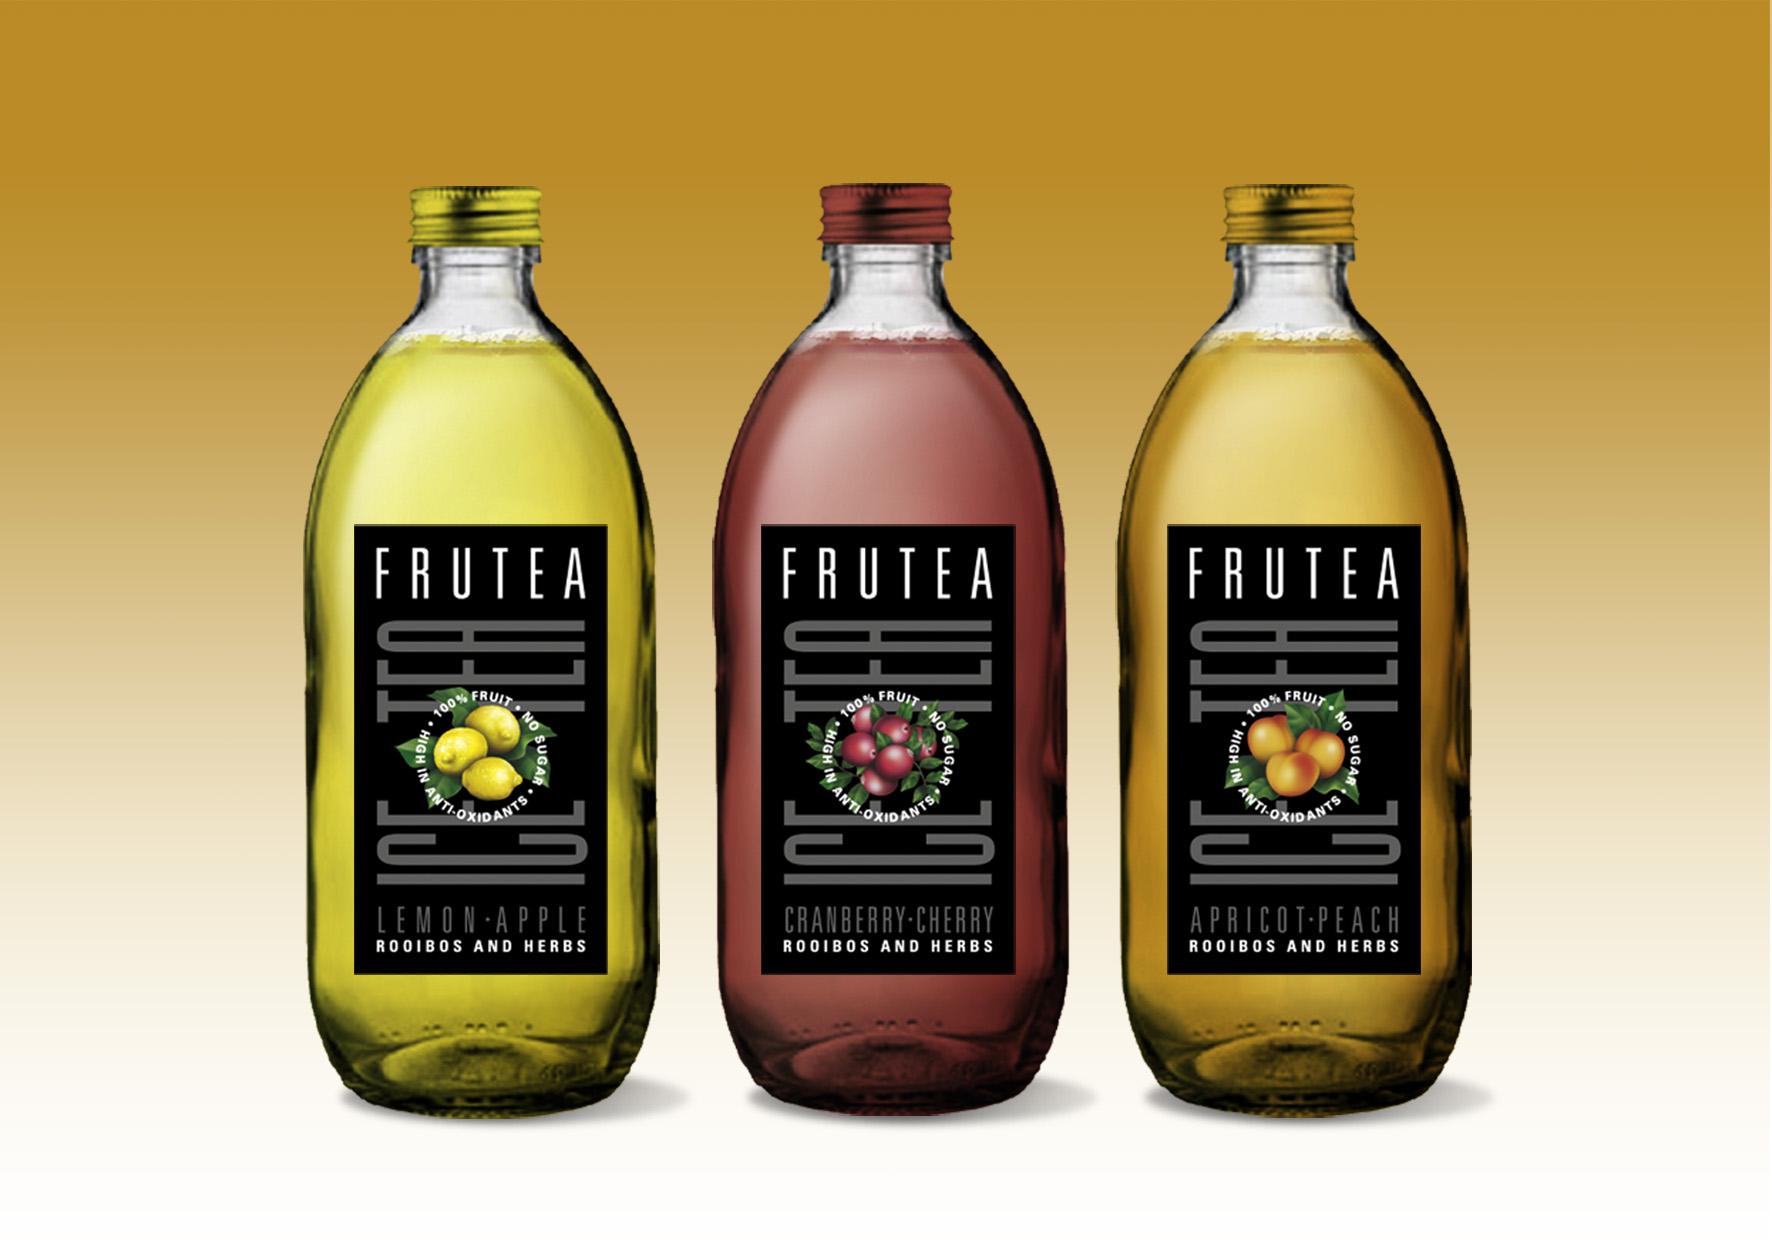 Frutea Packaging